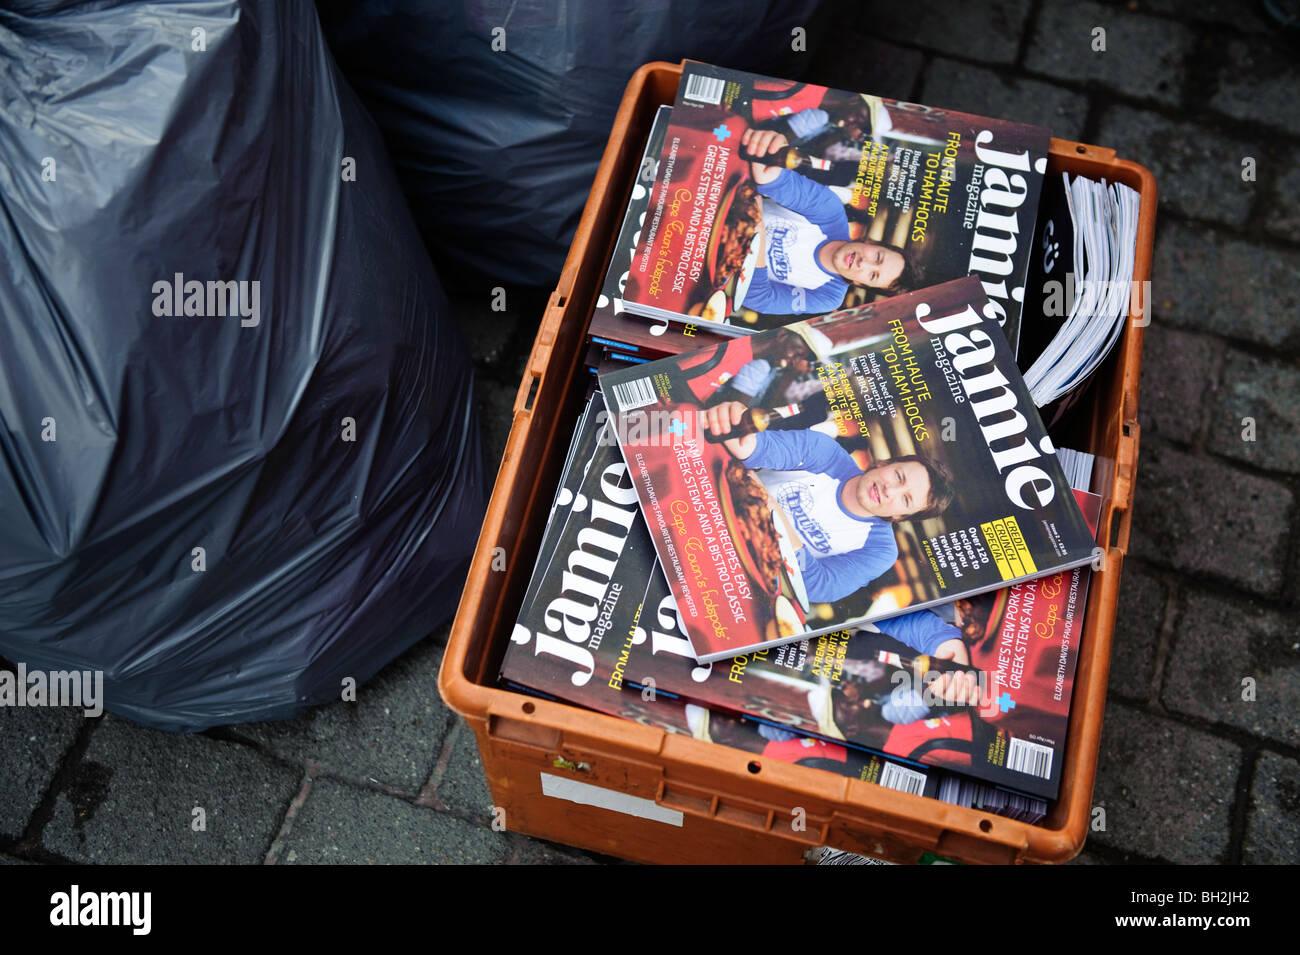 Copie invendute di Jamie TV celebrity chef Jamie Oliver's cookery magazine, in una cassa, in attesa di tornare Immagini Stock